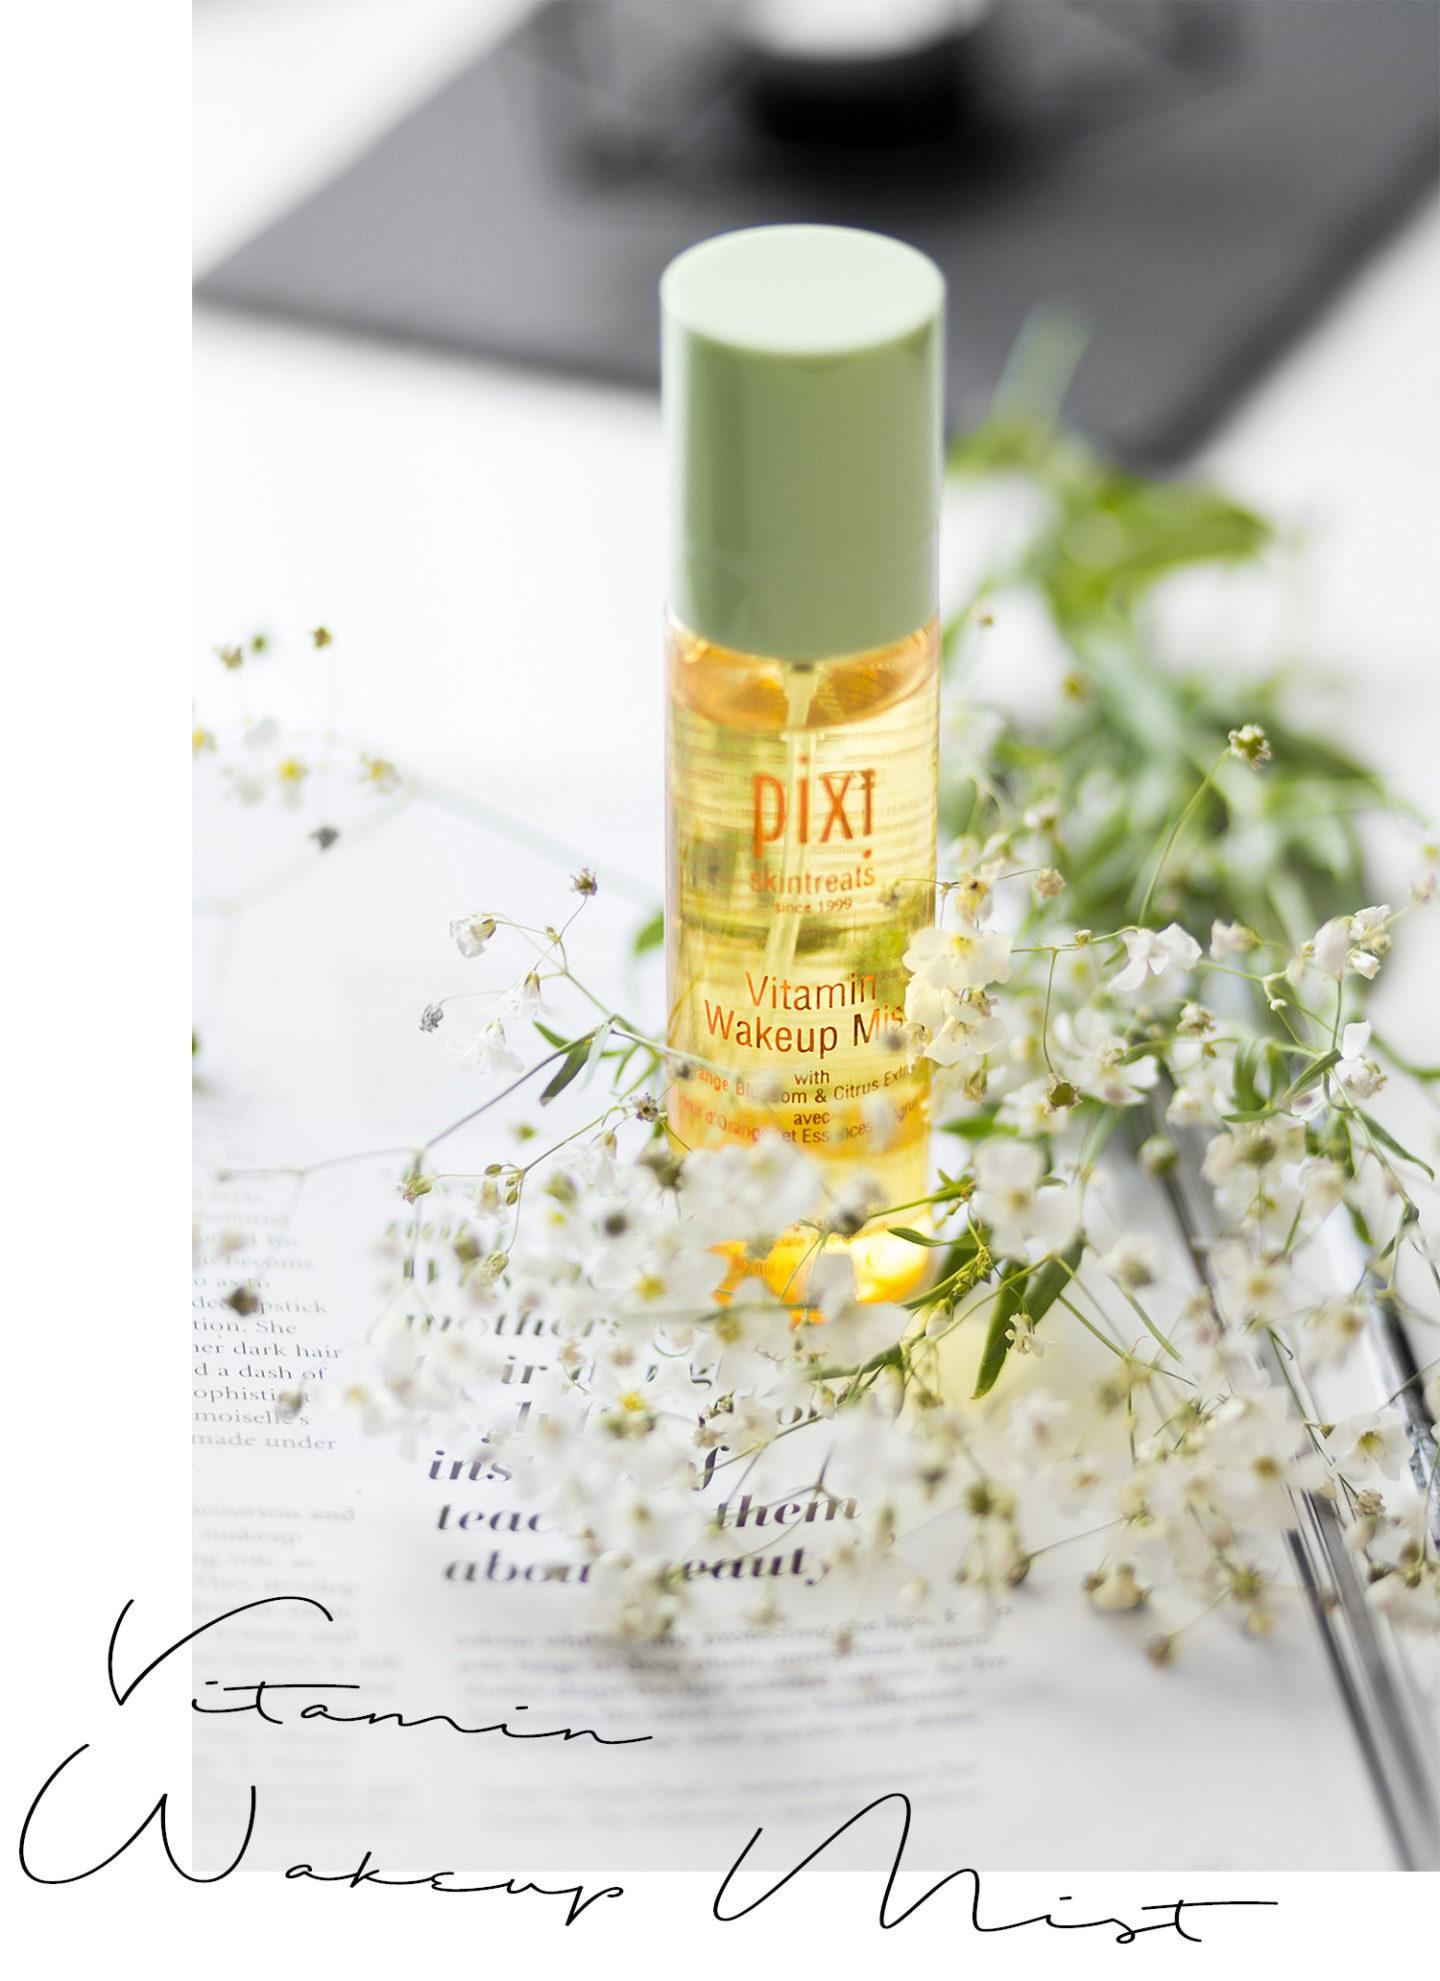 neuheiten-von pixi-vitamin-wakeup-mist-beauty-skincare-review-test-erfahrung-strahlende-haut-sommer-bezauberndenana